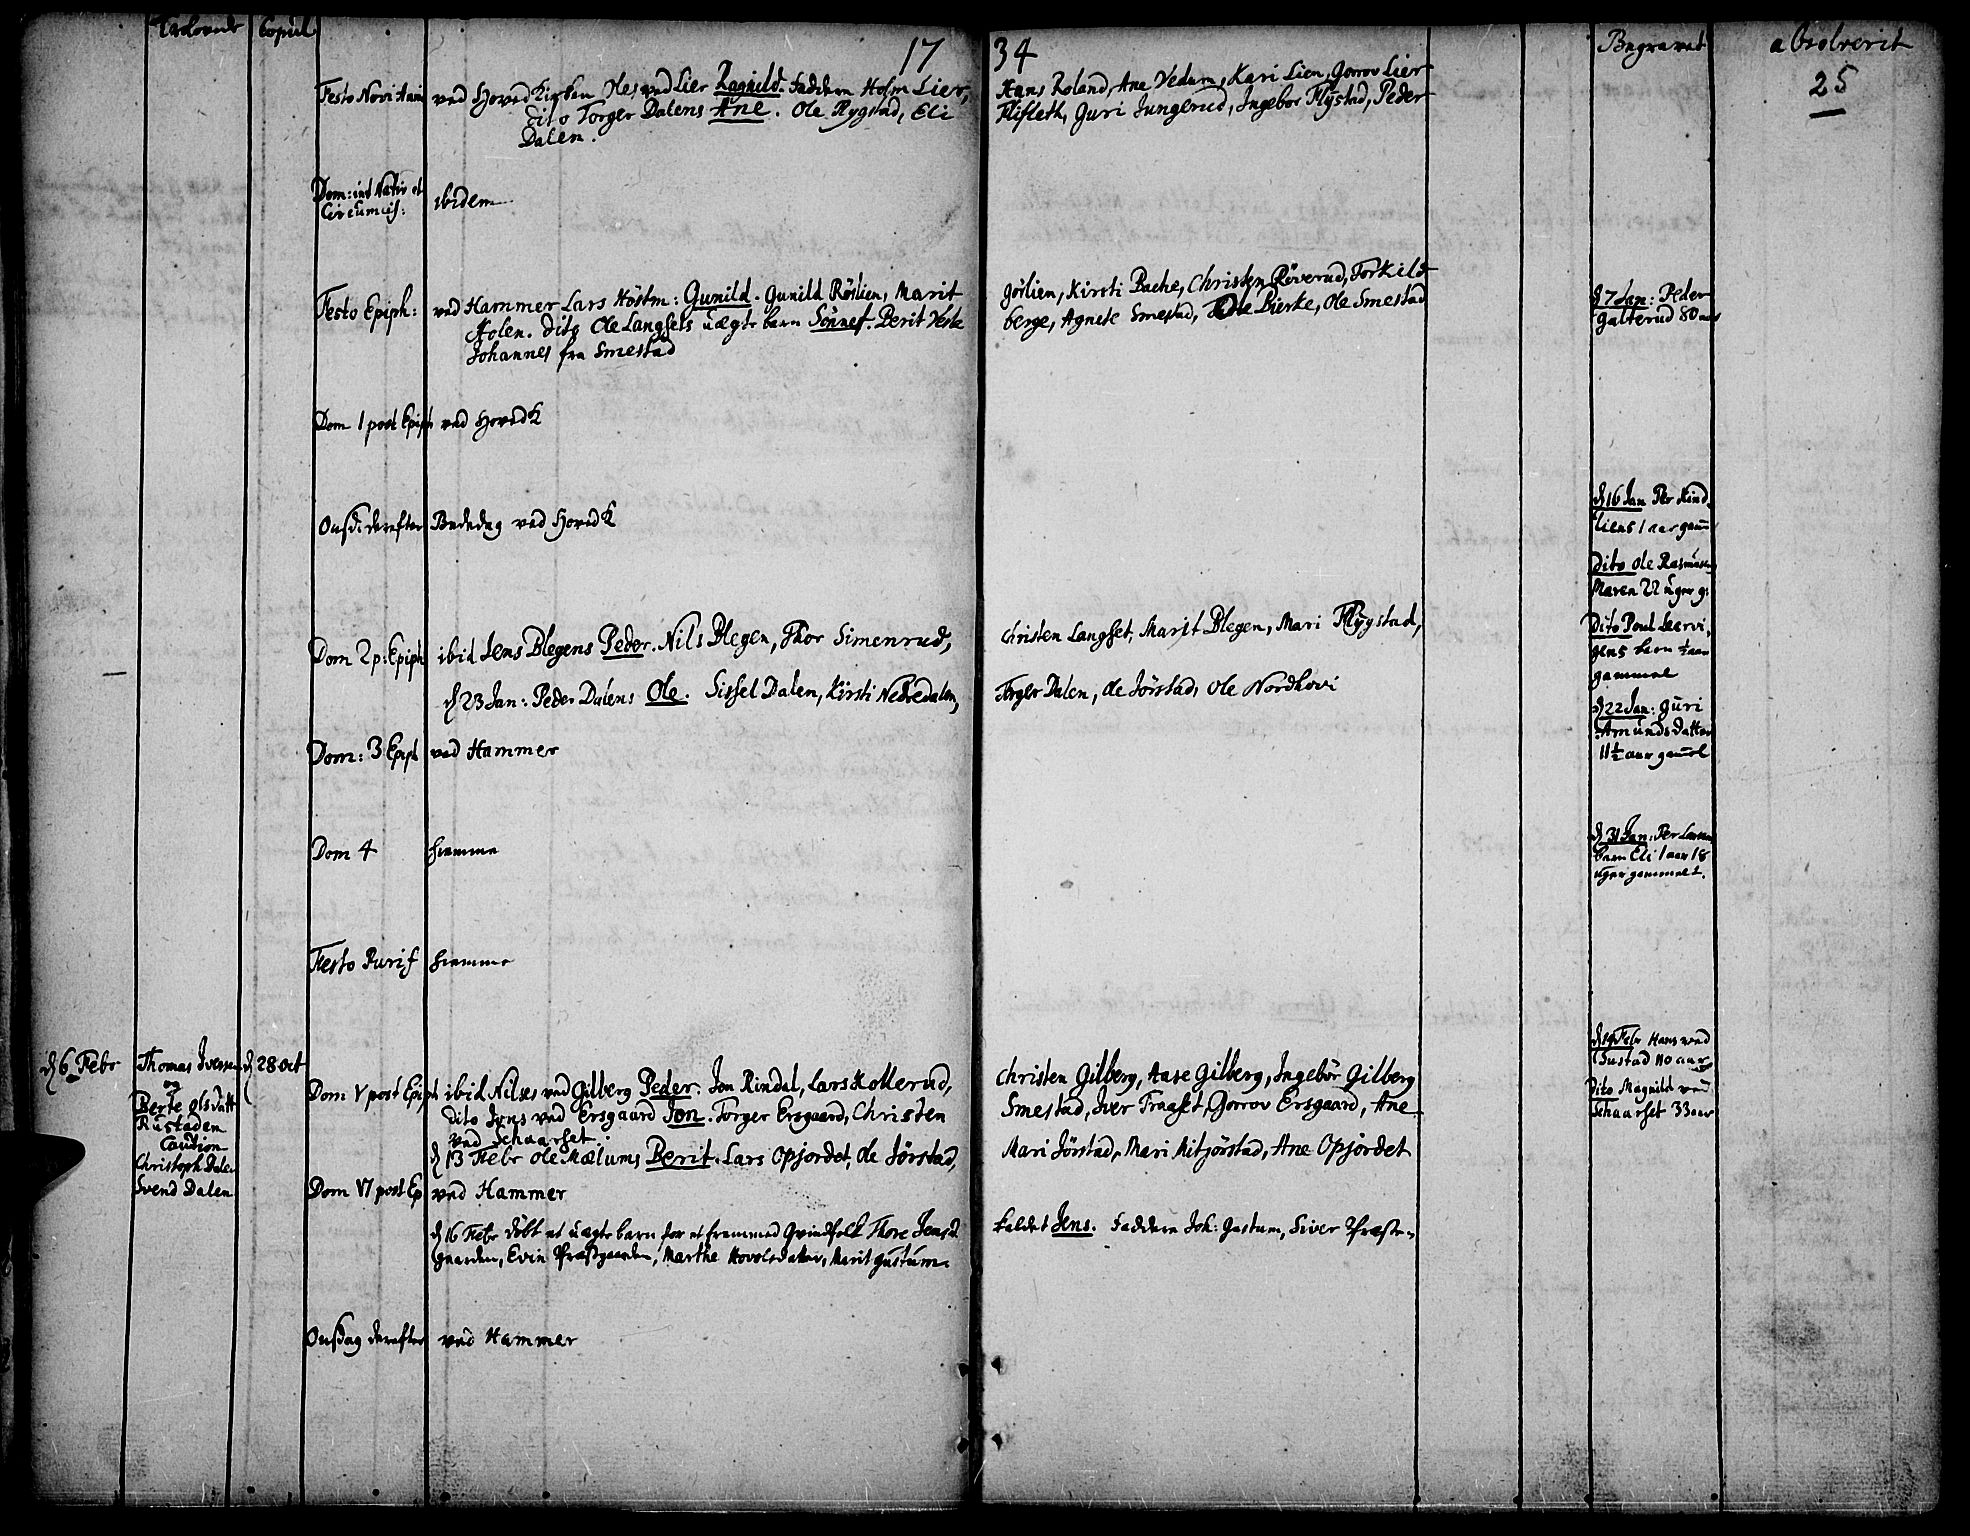 SAH, Fåberg prestekontor, Ministerialbok nr. 1, 1727-1775, s. 25